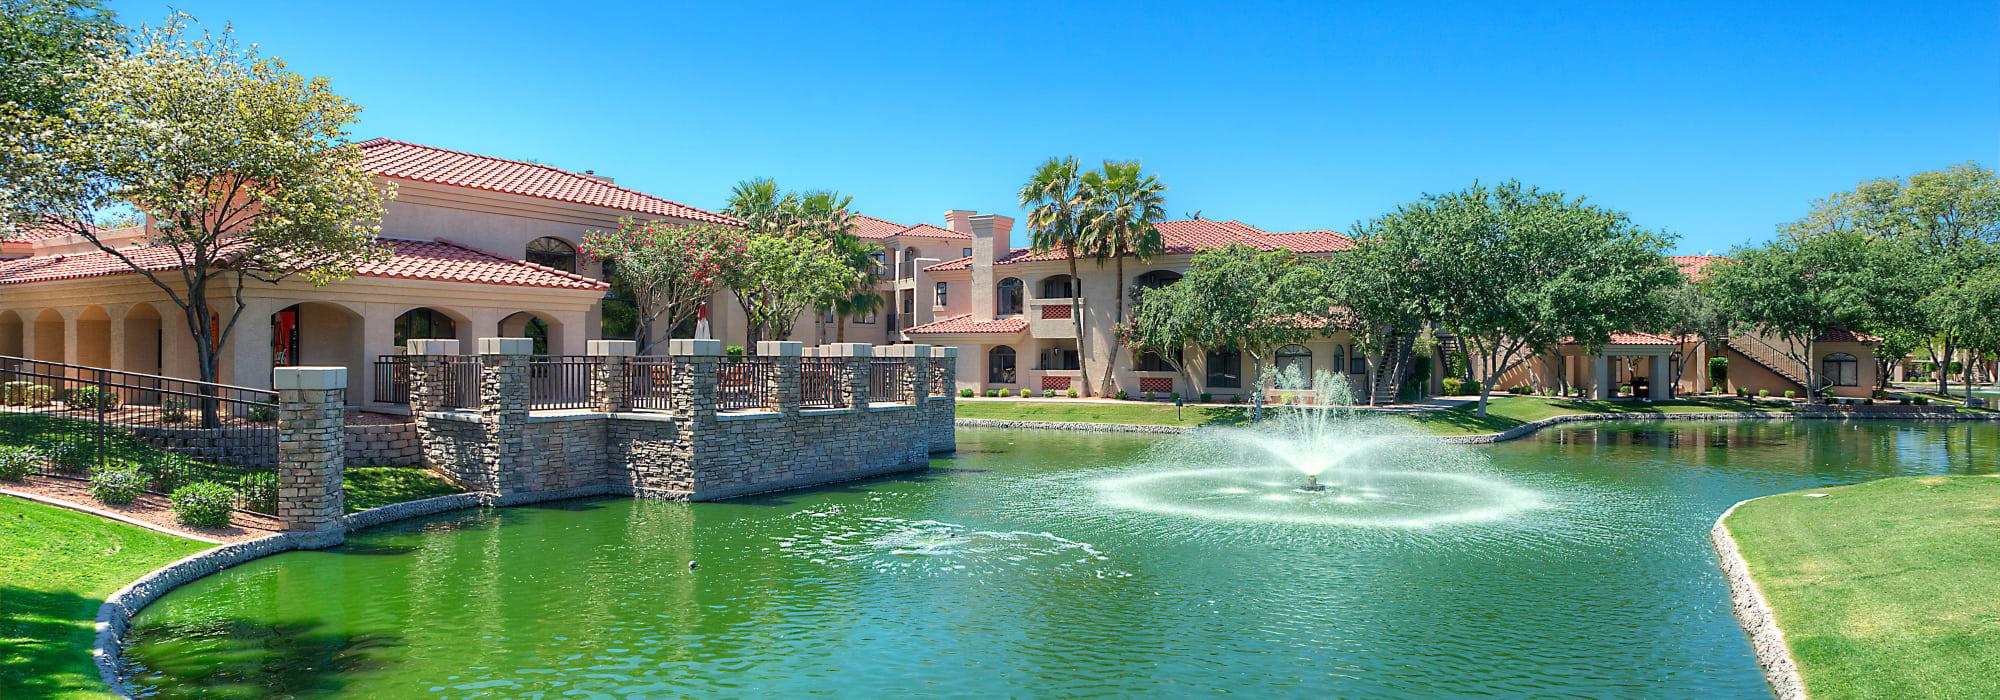 Apartment community pond at San Lagos in Glendale, Arizona